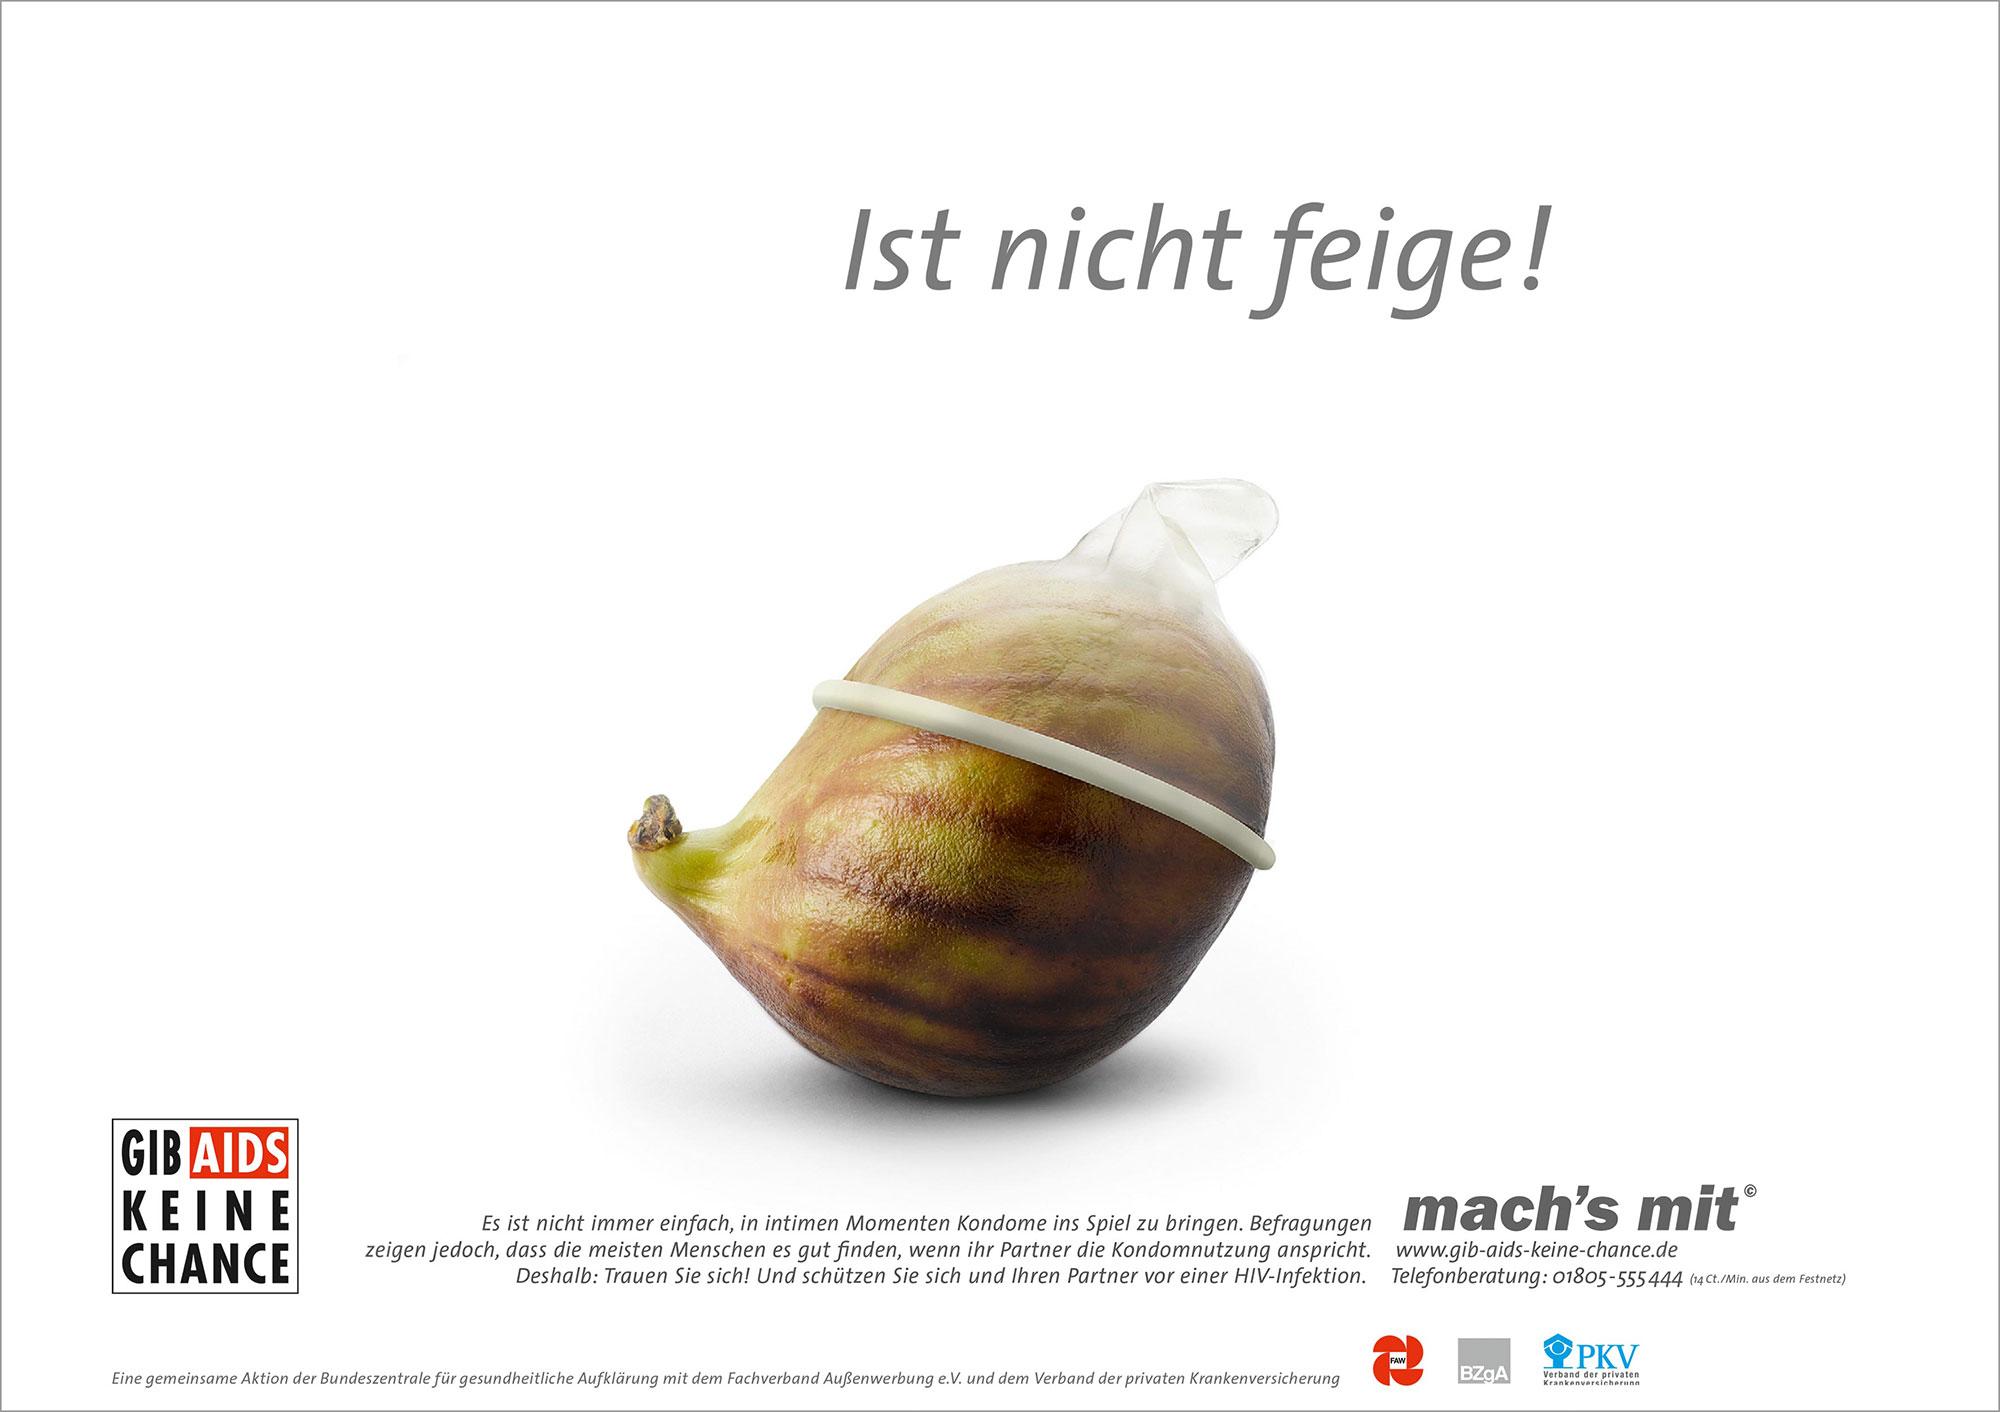 Advertising Still life Photographie Fotografie Studio BZGA mach´s mit AIDS Kampagne Feige Kondom Idris Kolodziej